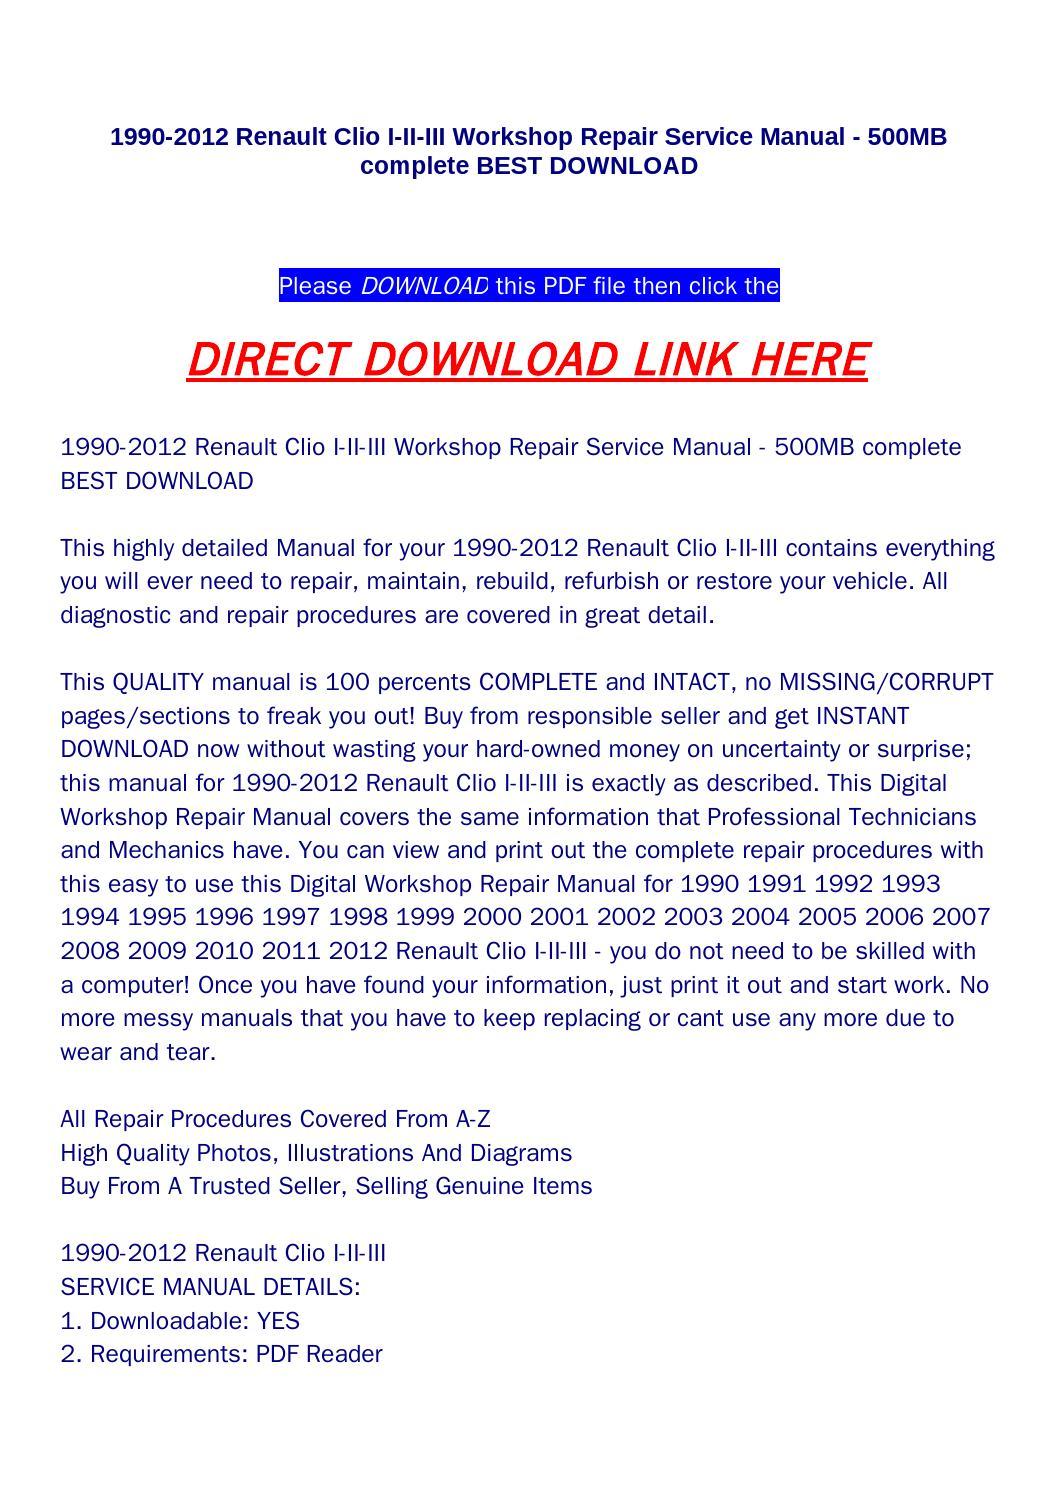 1990 2012 Renault Clio I Ii Iii Workshop Repair Service Manual 500mb Complete Best Download By Haoxie Issuu